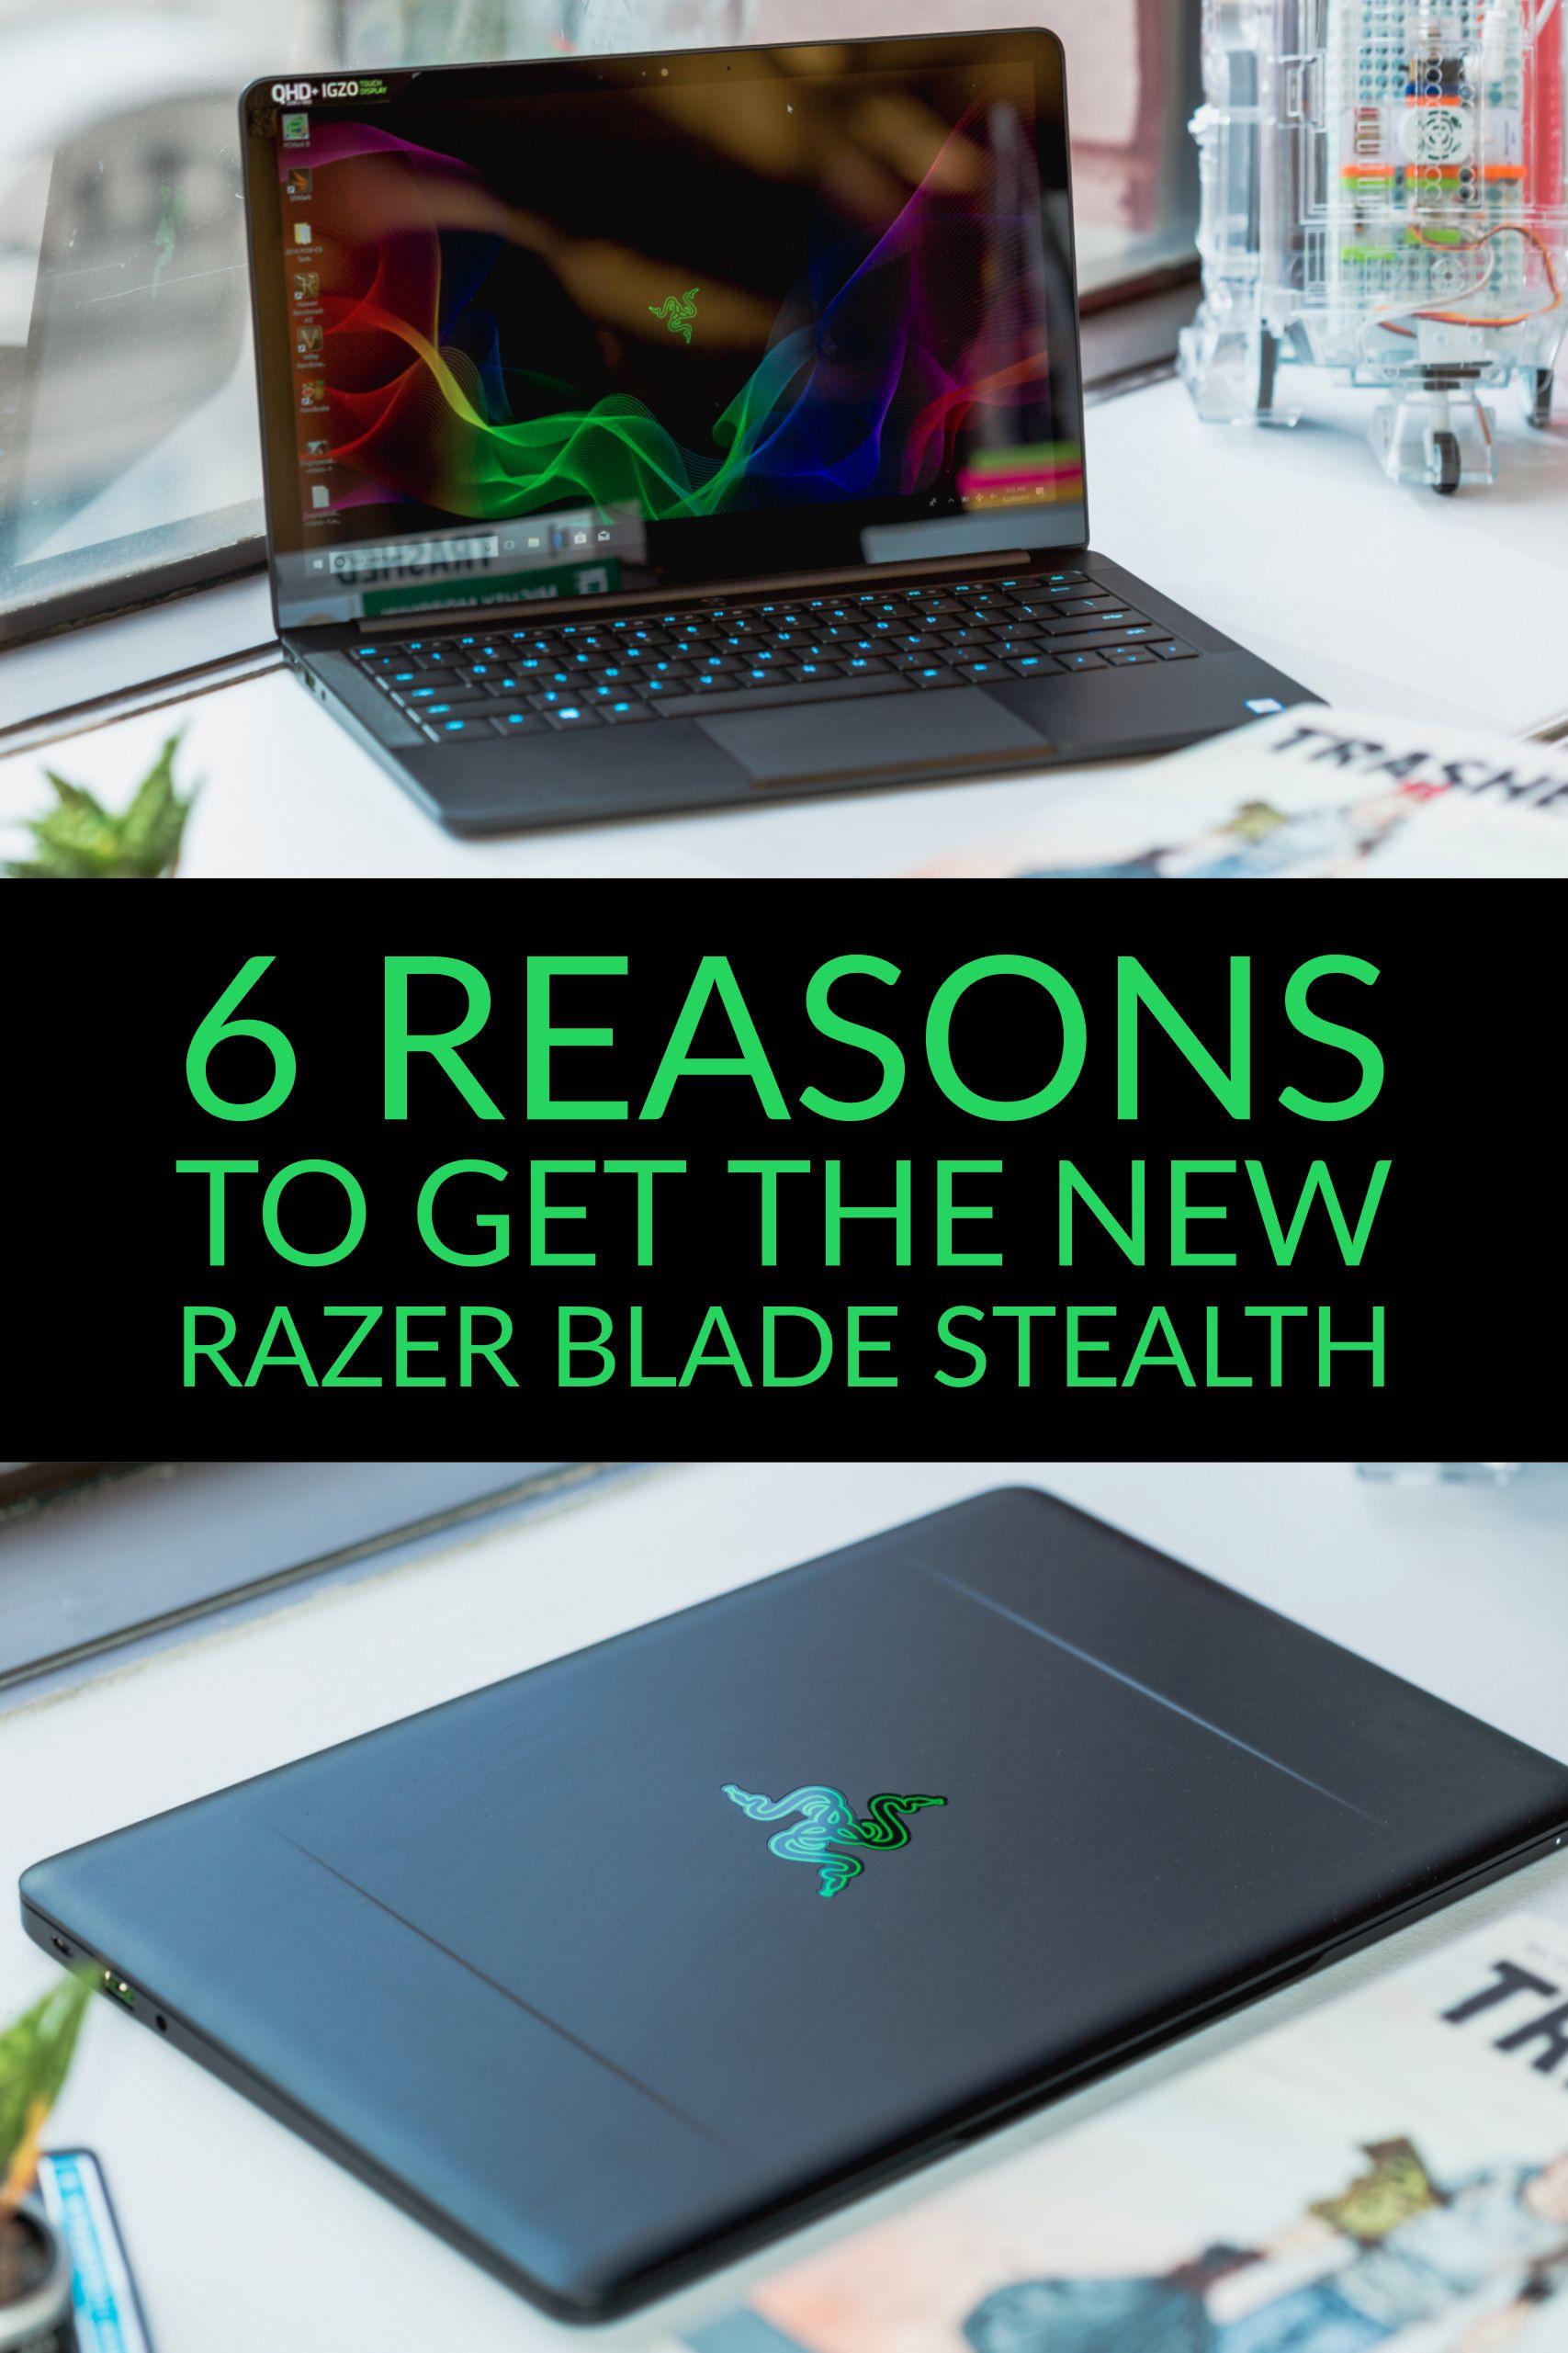 razer blade stealth 13 3 qhd early 2018 laptops pinterest